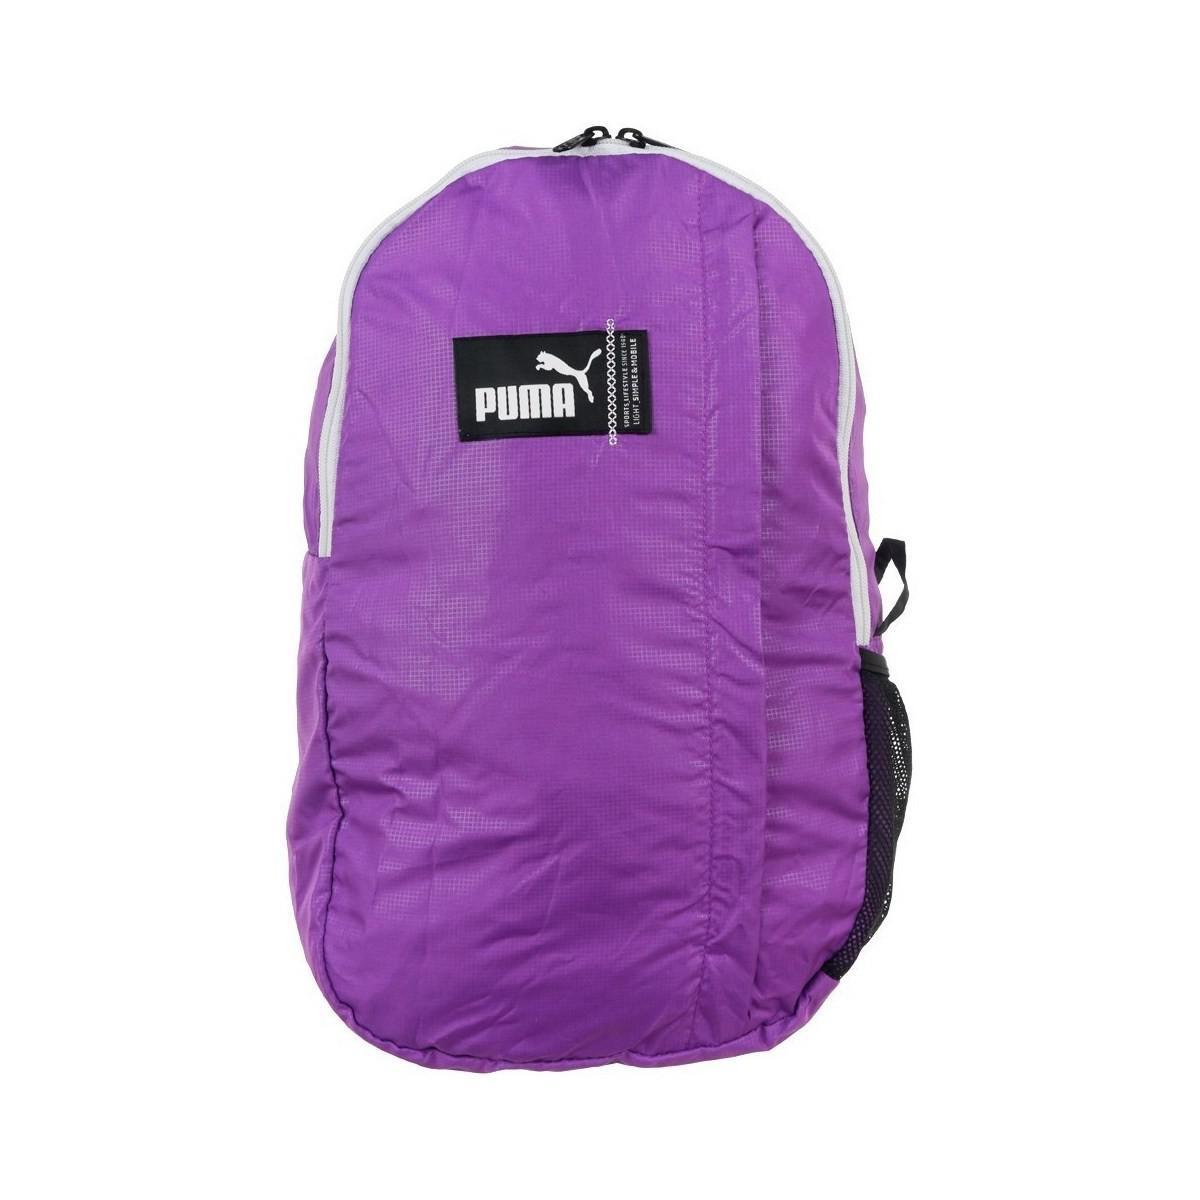 856e60e84b PUMA Pack Away Backpack Men's Backpack In Multicolour in Purple for ...